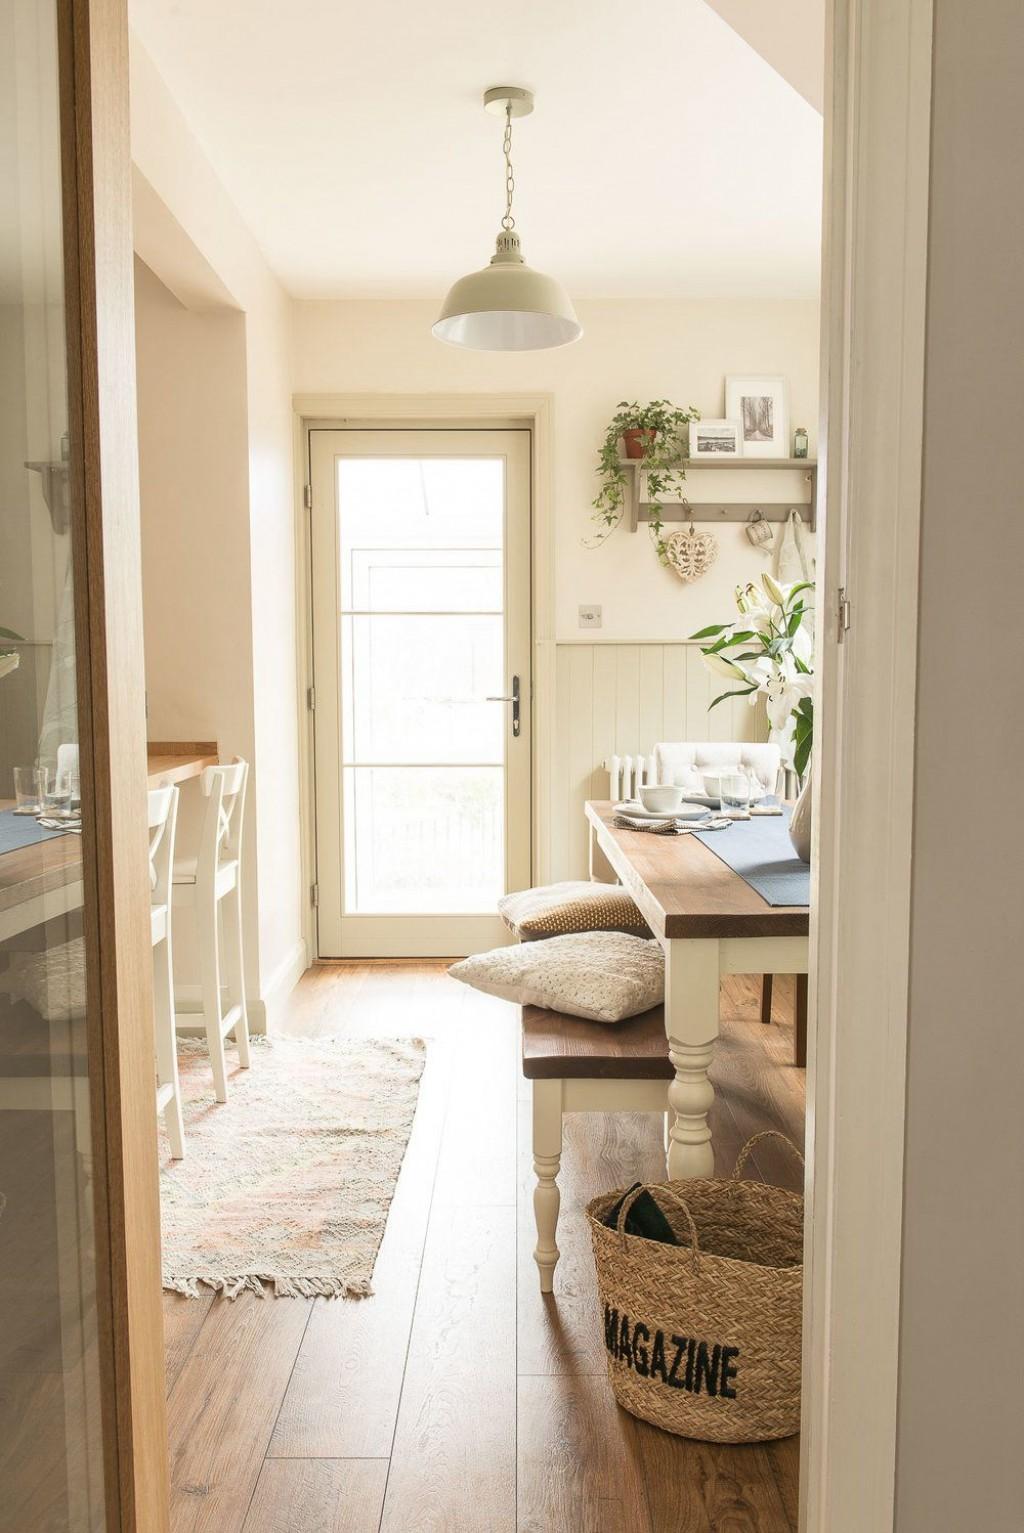 005 Wondrou Best Home Renovation Budget Template Excel Free High Definition Large